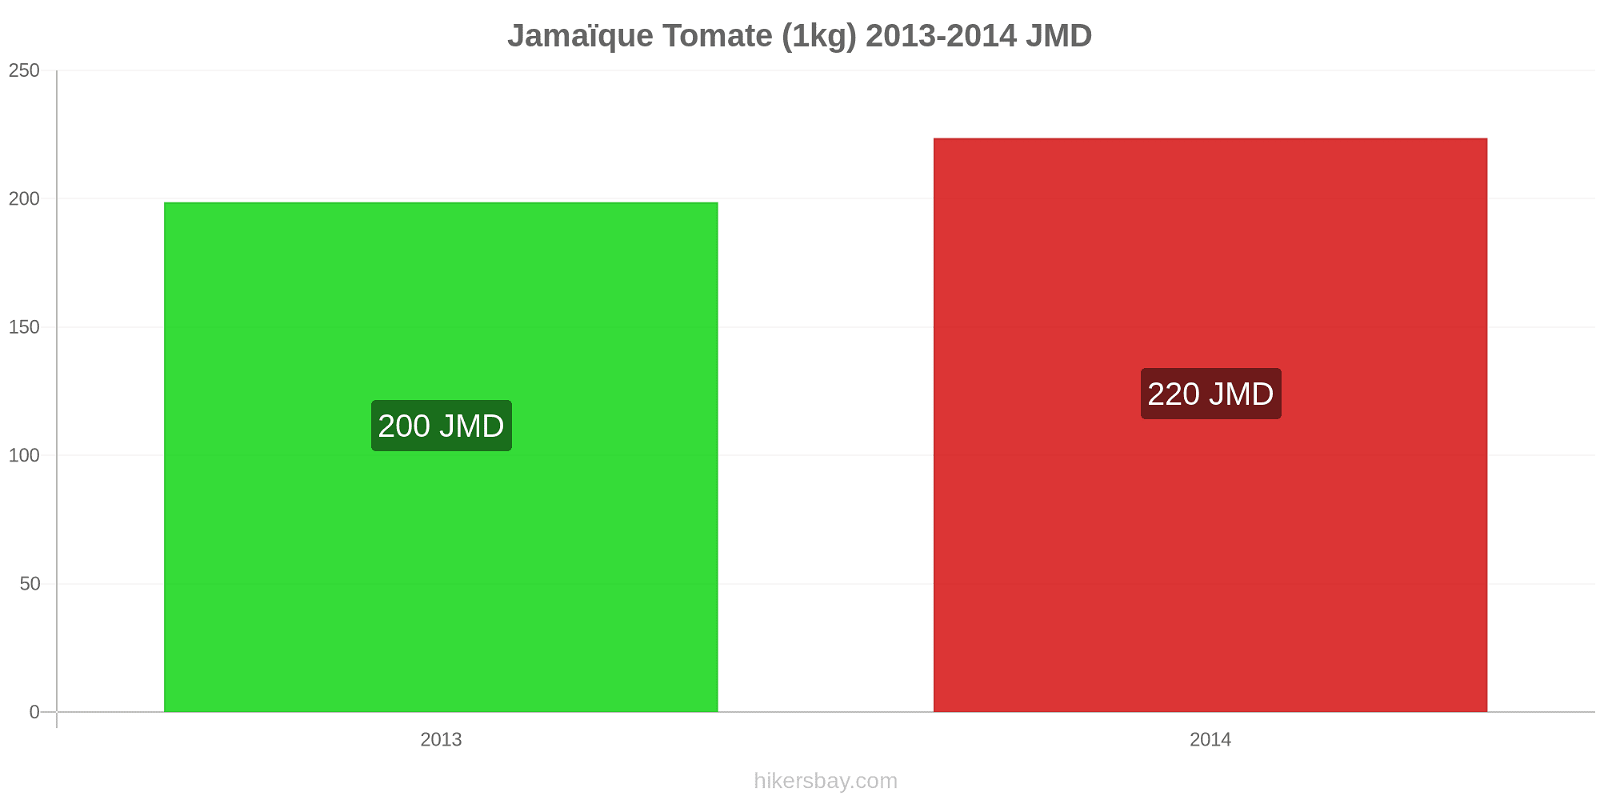 Jamaïque changements de prix Tomate (1kg) hikersbay.com